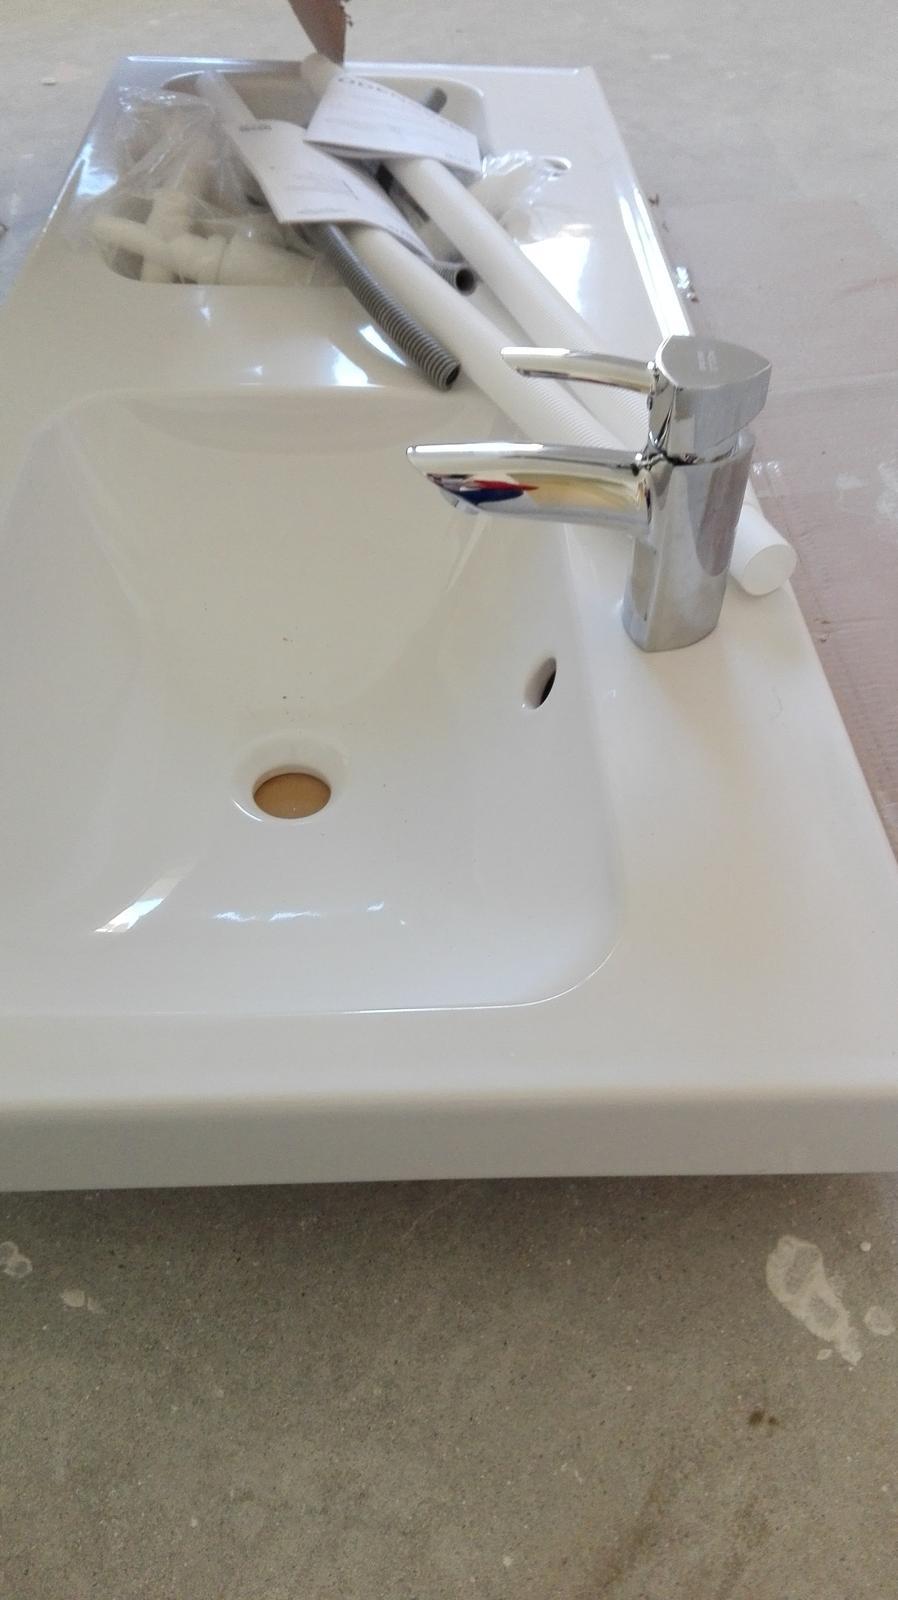 Môj výber do domu ::)) - Verim ze sme trafili velkost, nie je nad to pohodlne si umyt ruky ☺